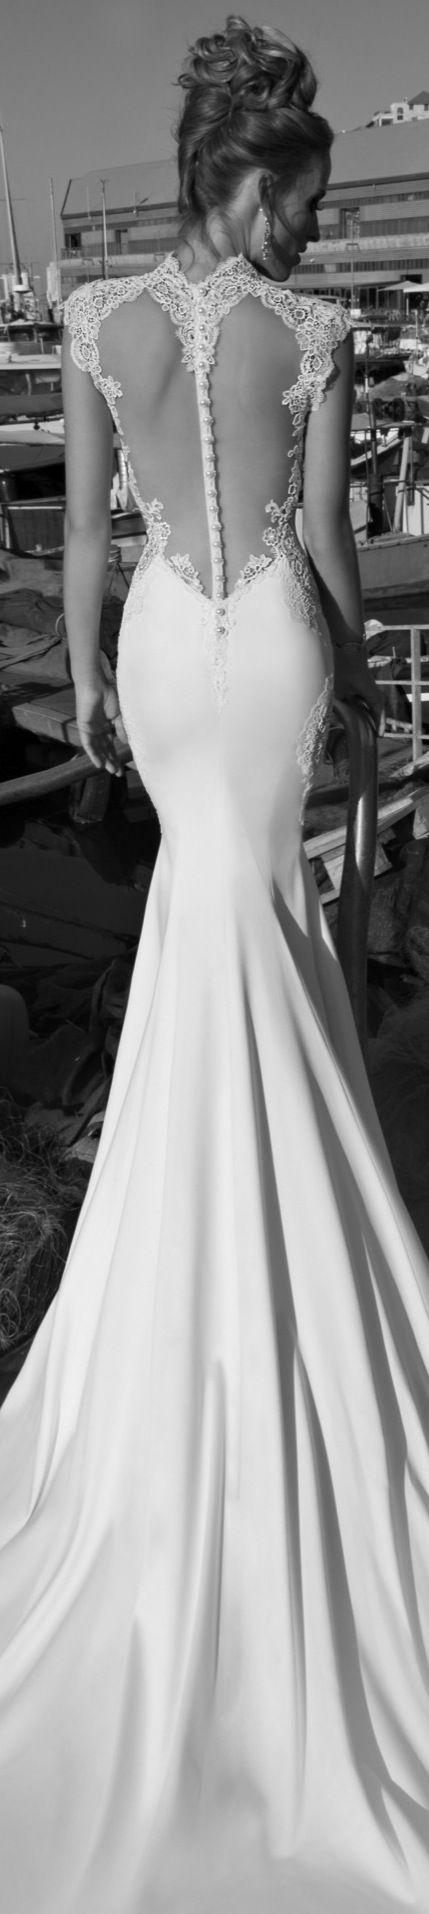 Dolce by #GaliaLahav #wedding #dress